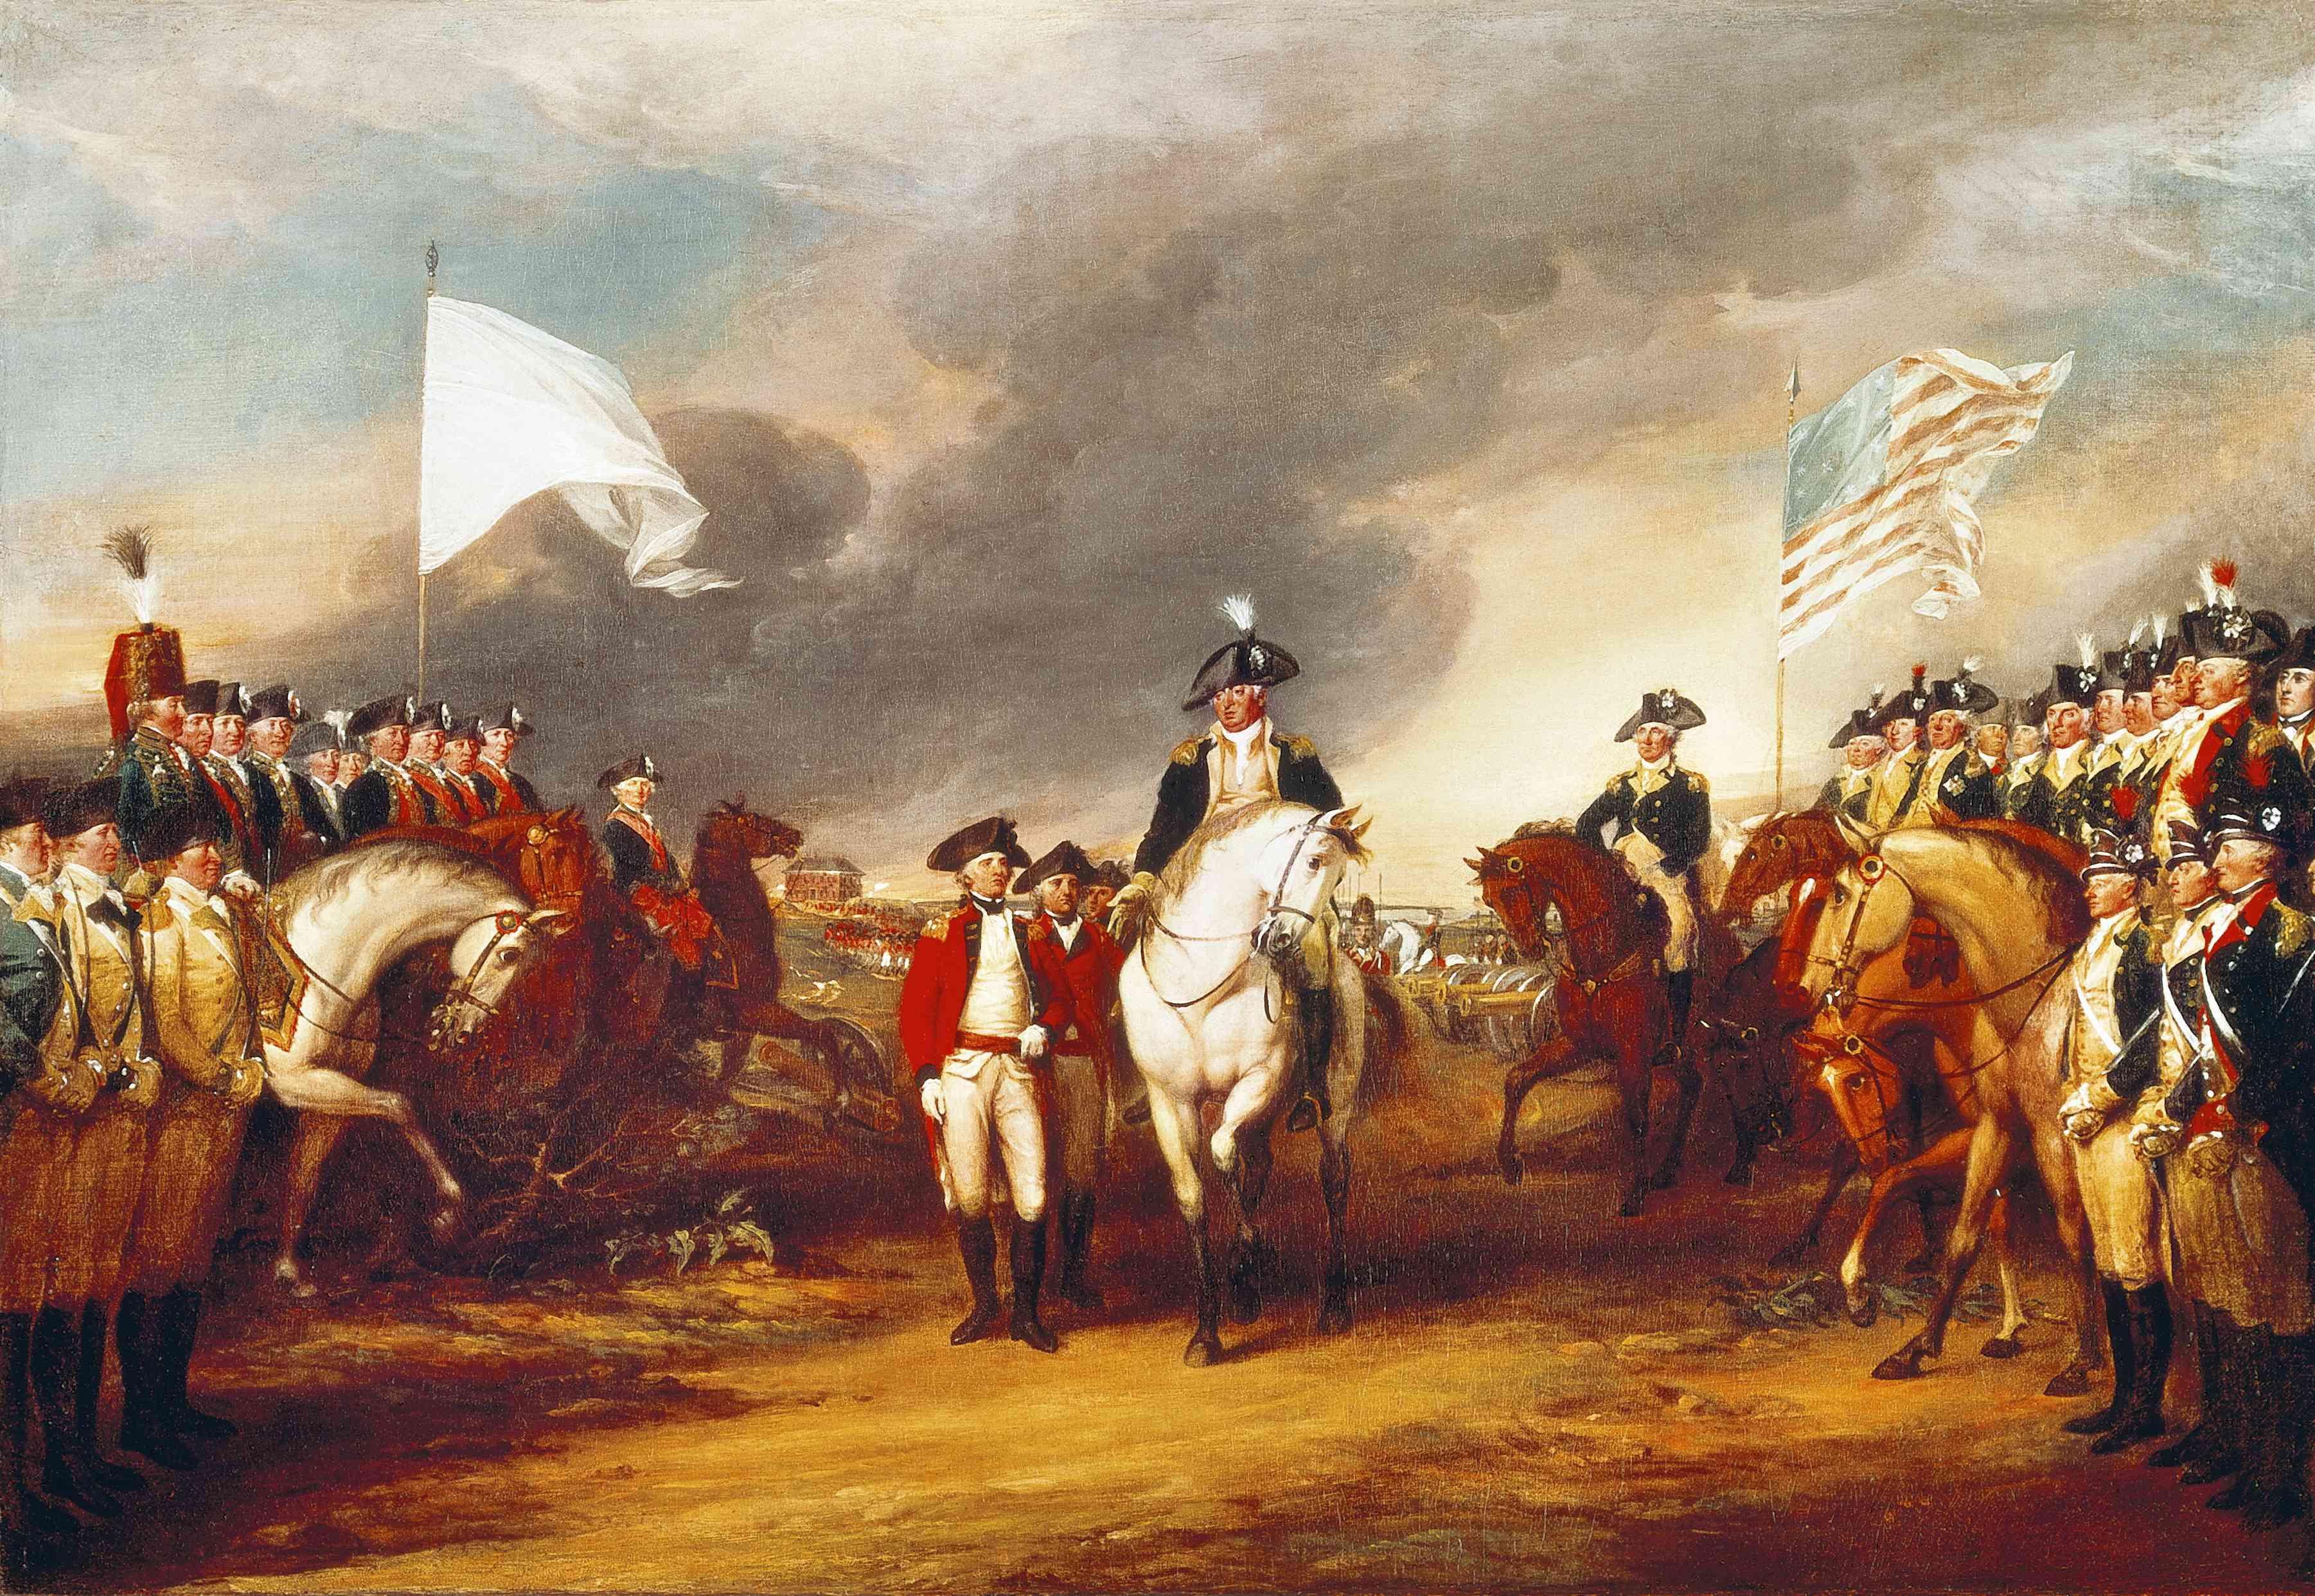 The surrender of Cornwallis at Yorktown, October 19, 1781